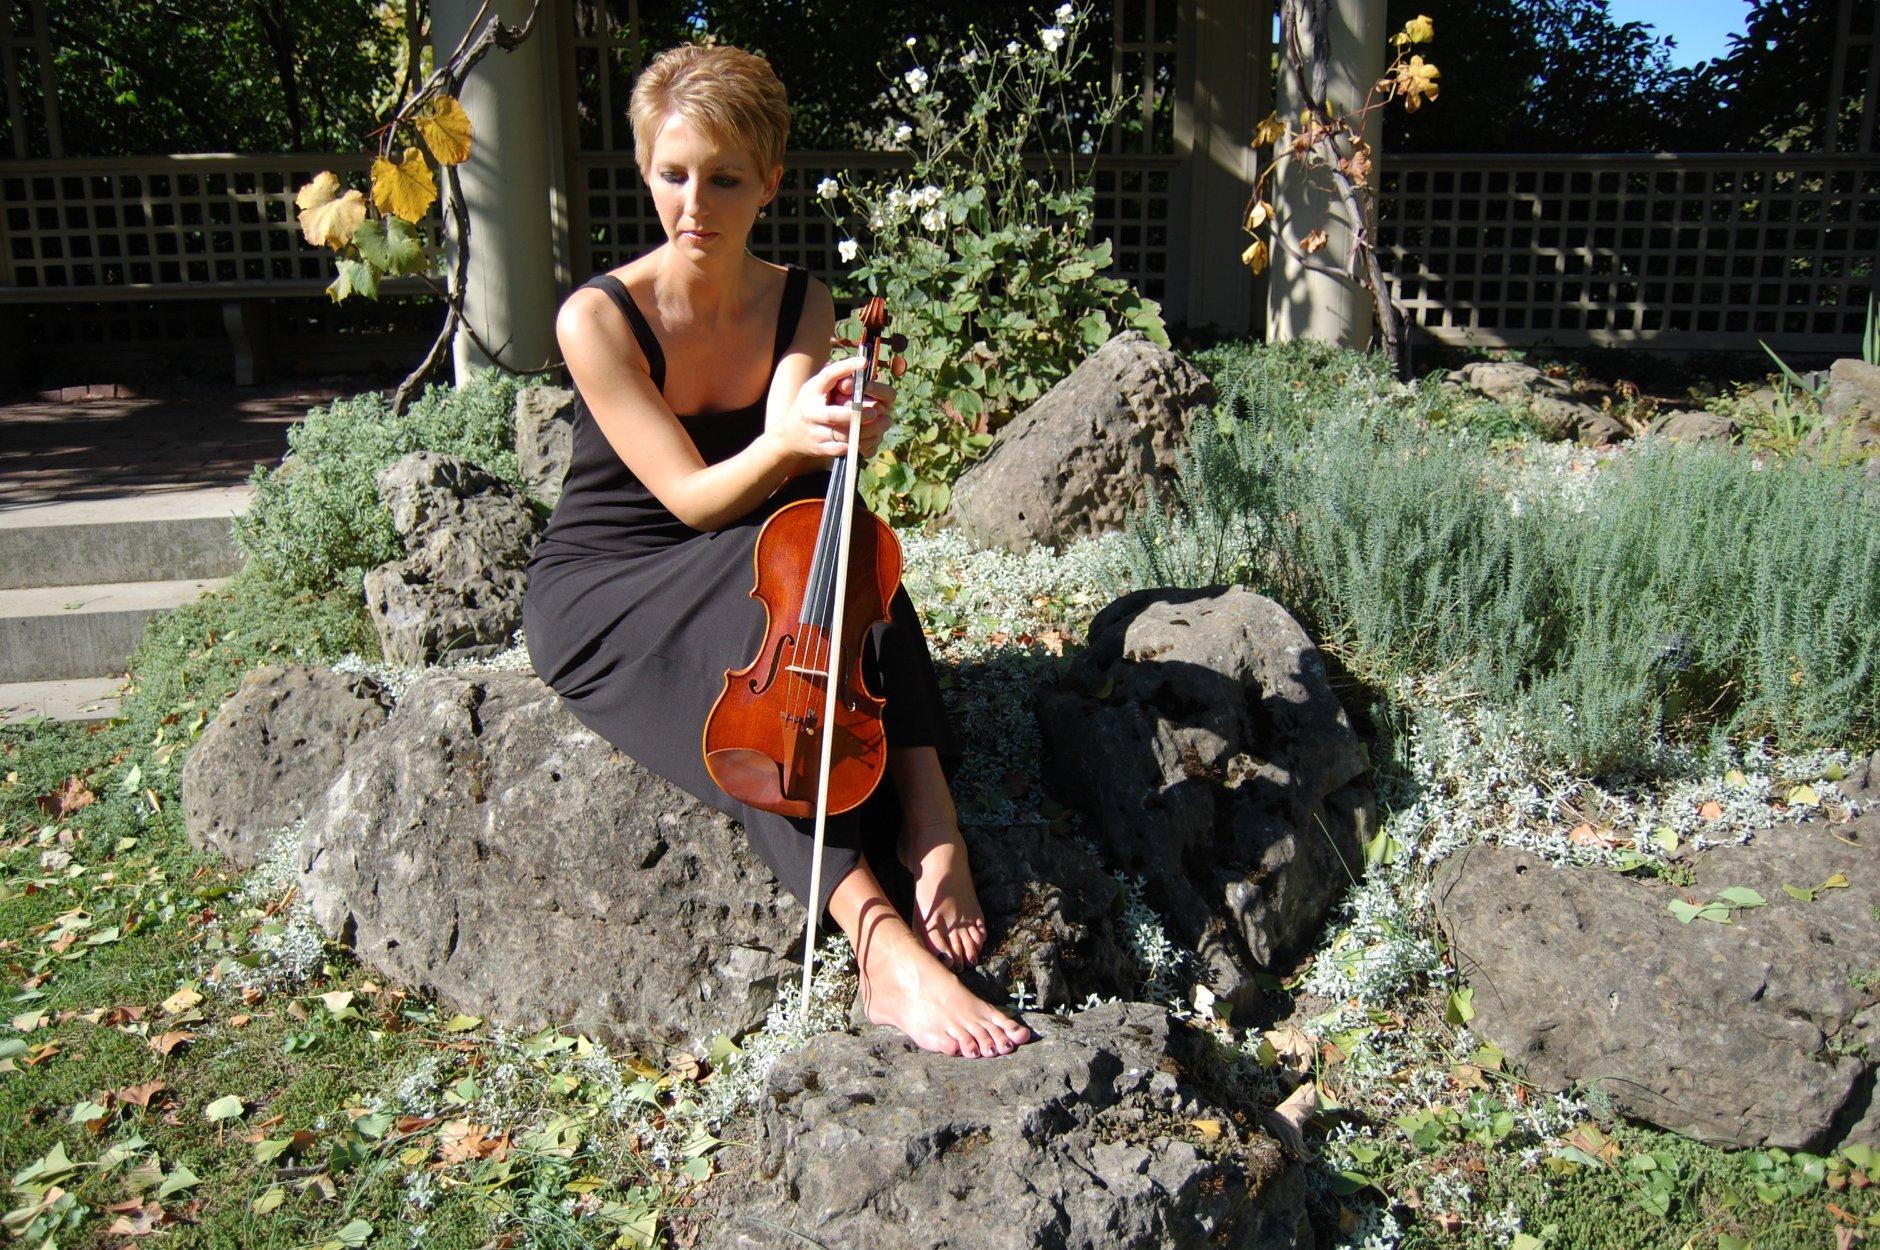 karine violin portrait pic 10